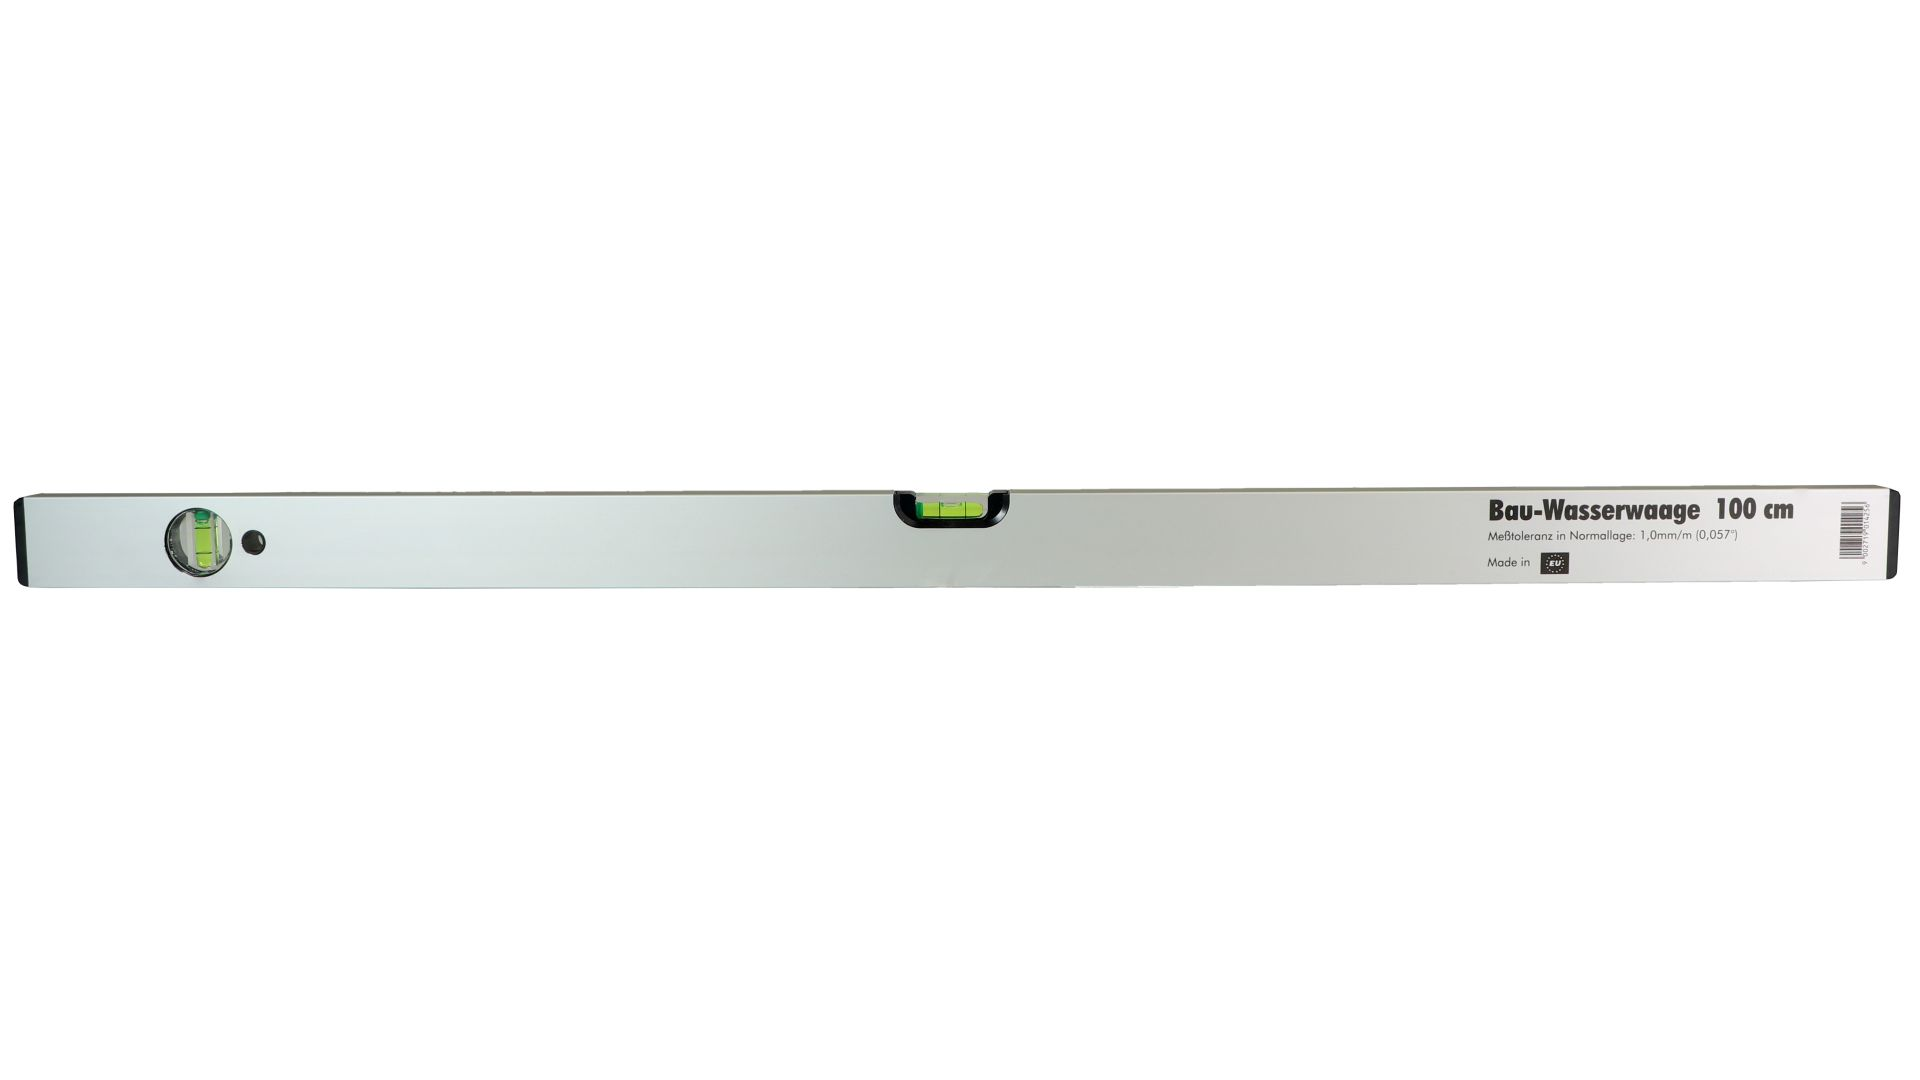 SOLA Alu-Wasserwaage, BAU 100, Länge 100 cm